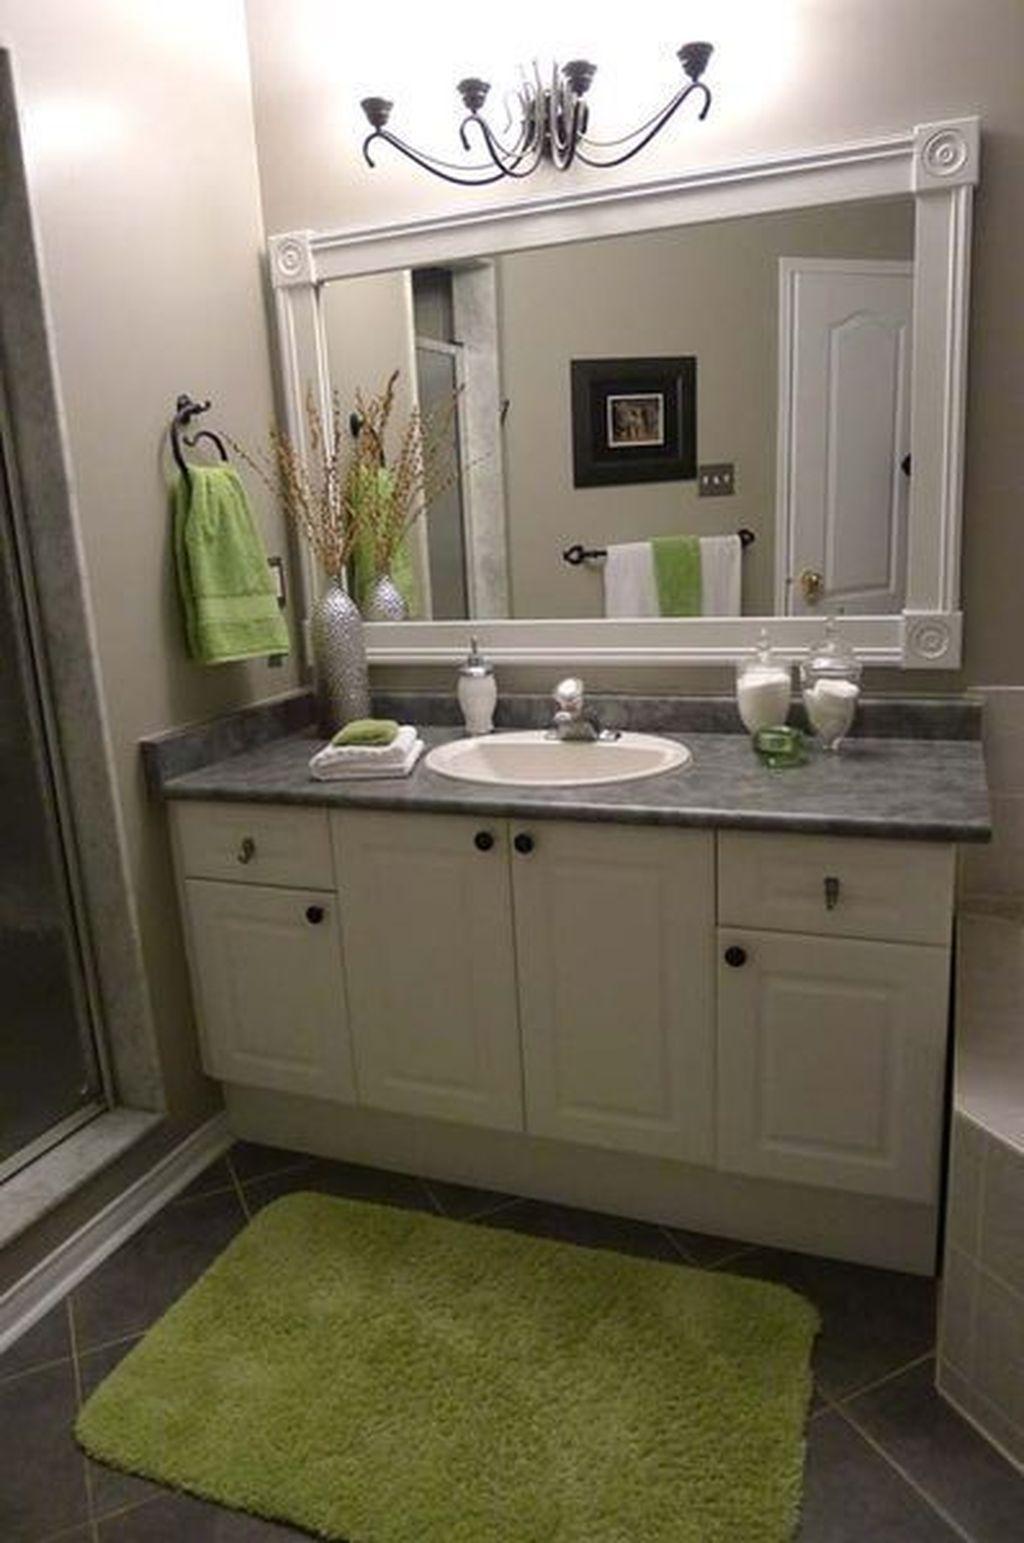 44 Beautiful Bathroom Mirror Design Ideas Homyhomee Bathroom Mirrors Diy Bathroom Mirror Design Elegant Bathroom